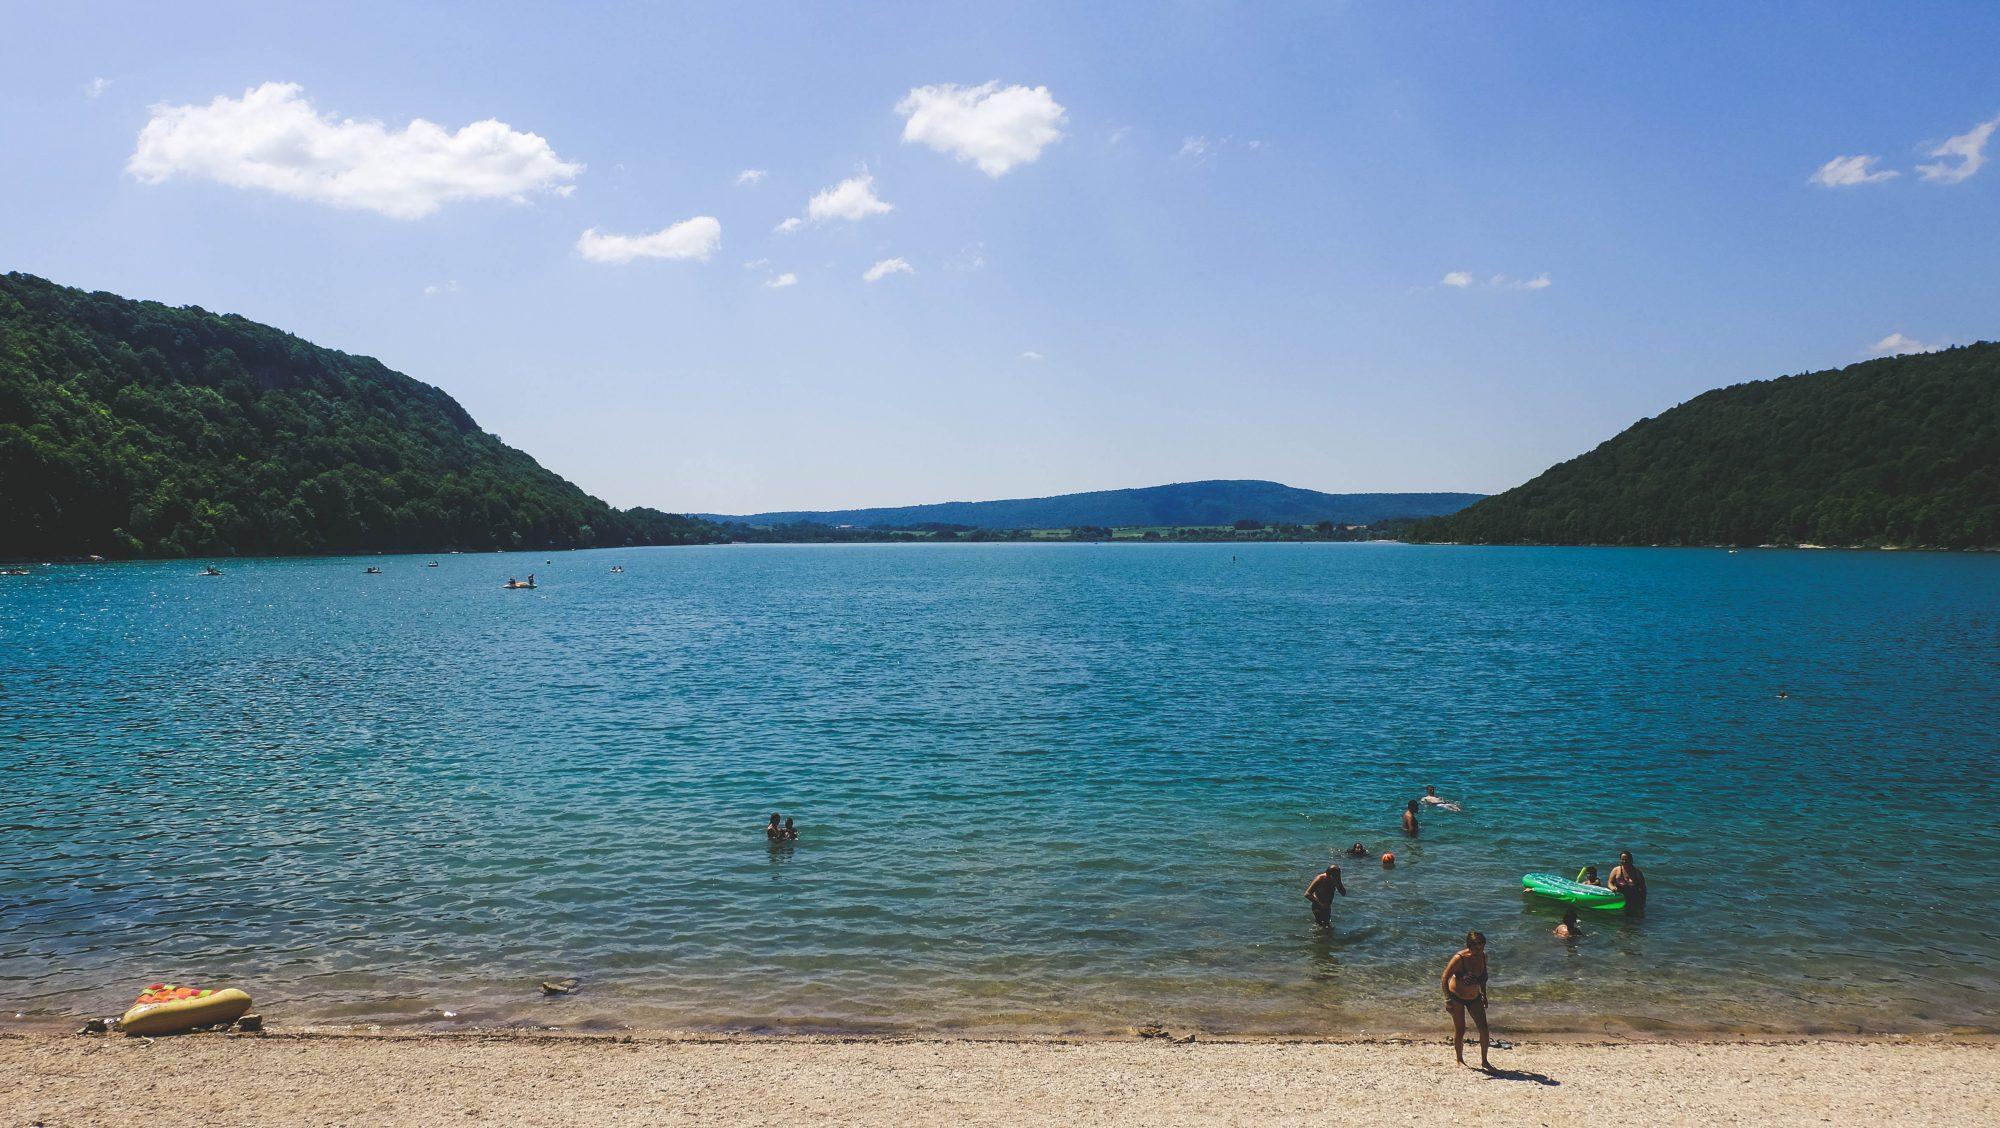 Lac de Chalain - Lac de Chalain, Fontenu